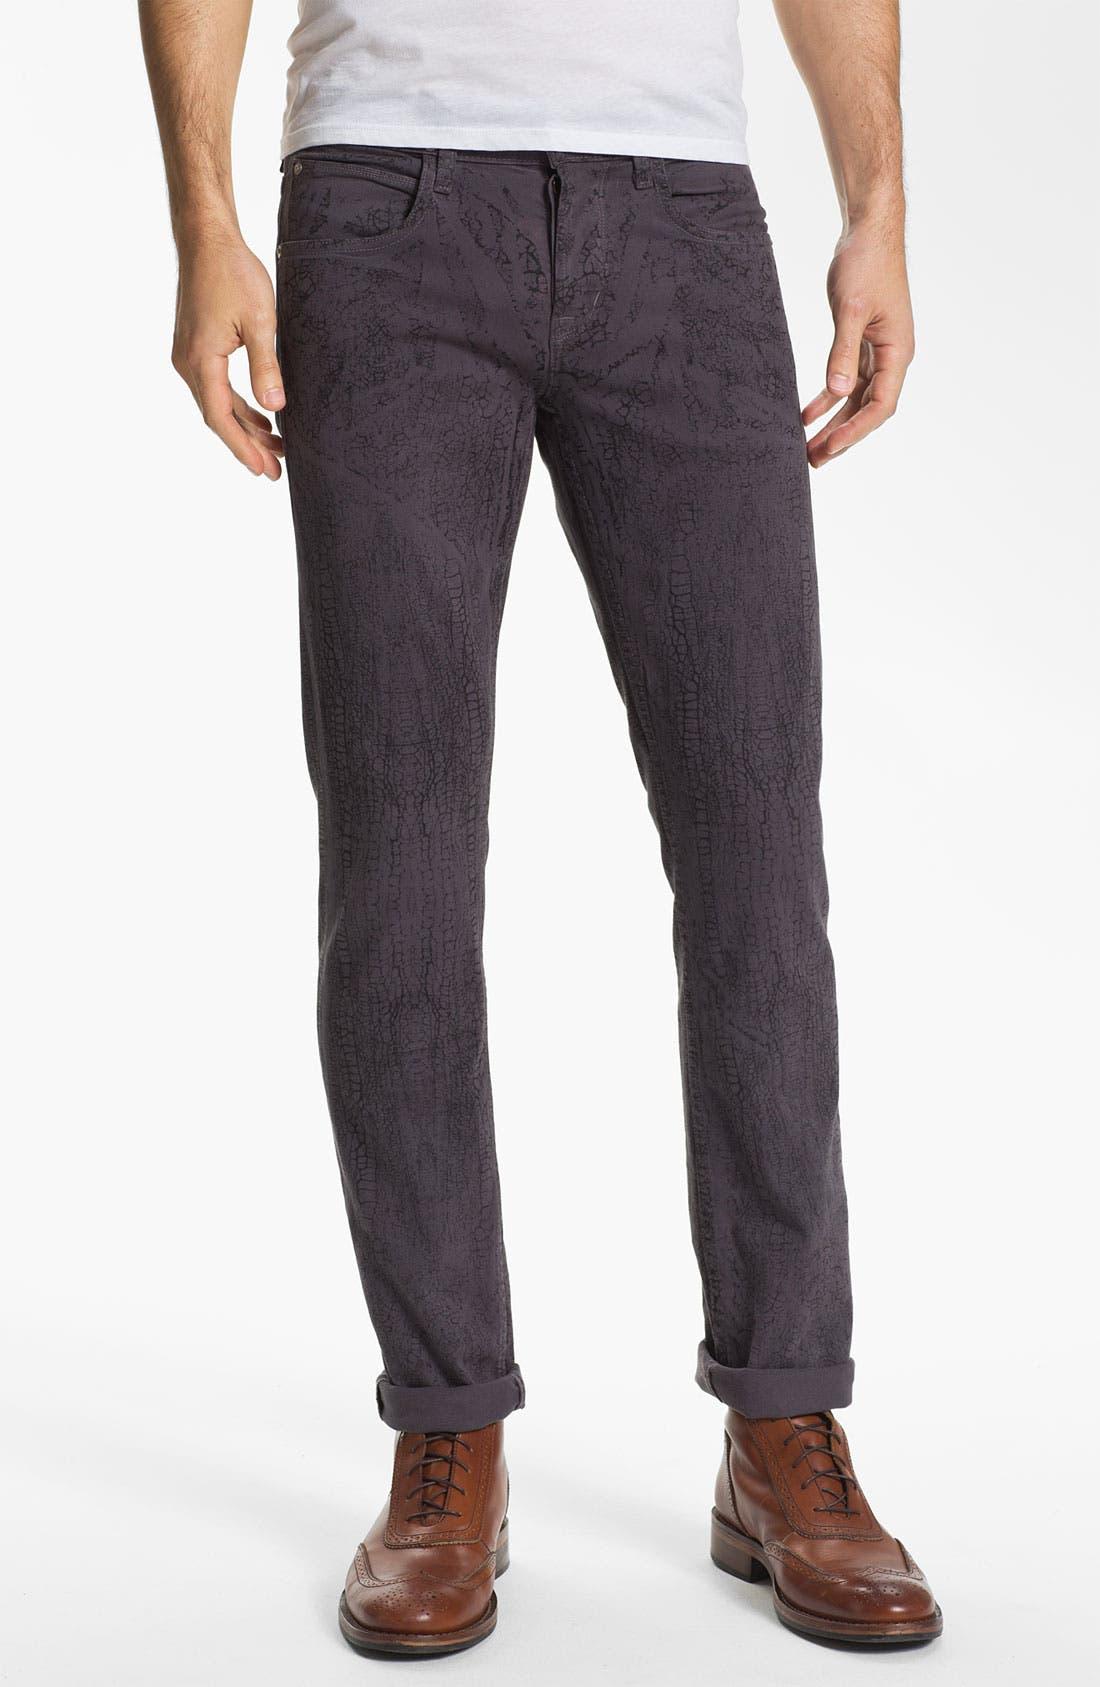 Alternate Image 1 Selected - Hudson Jeans 'Sartor' Slouchy Skinny Leg Jeans (Gone Platinum)